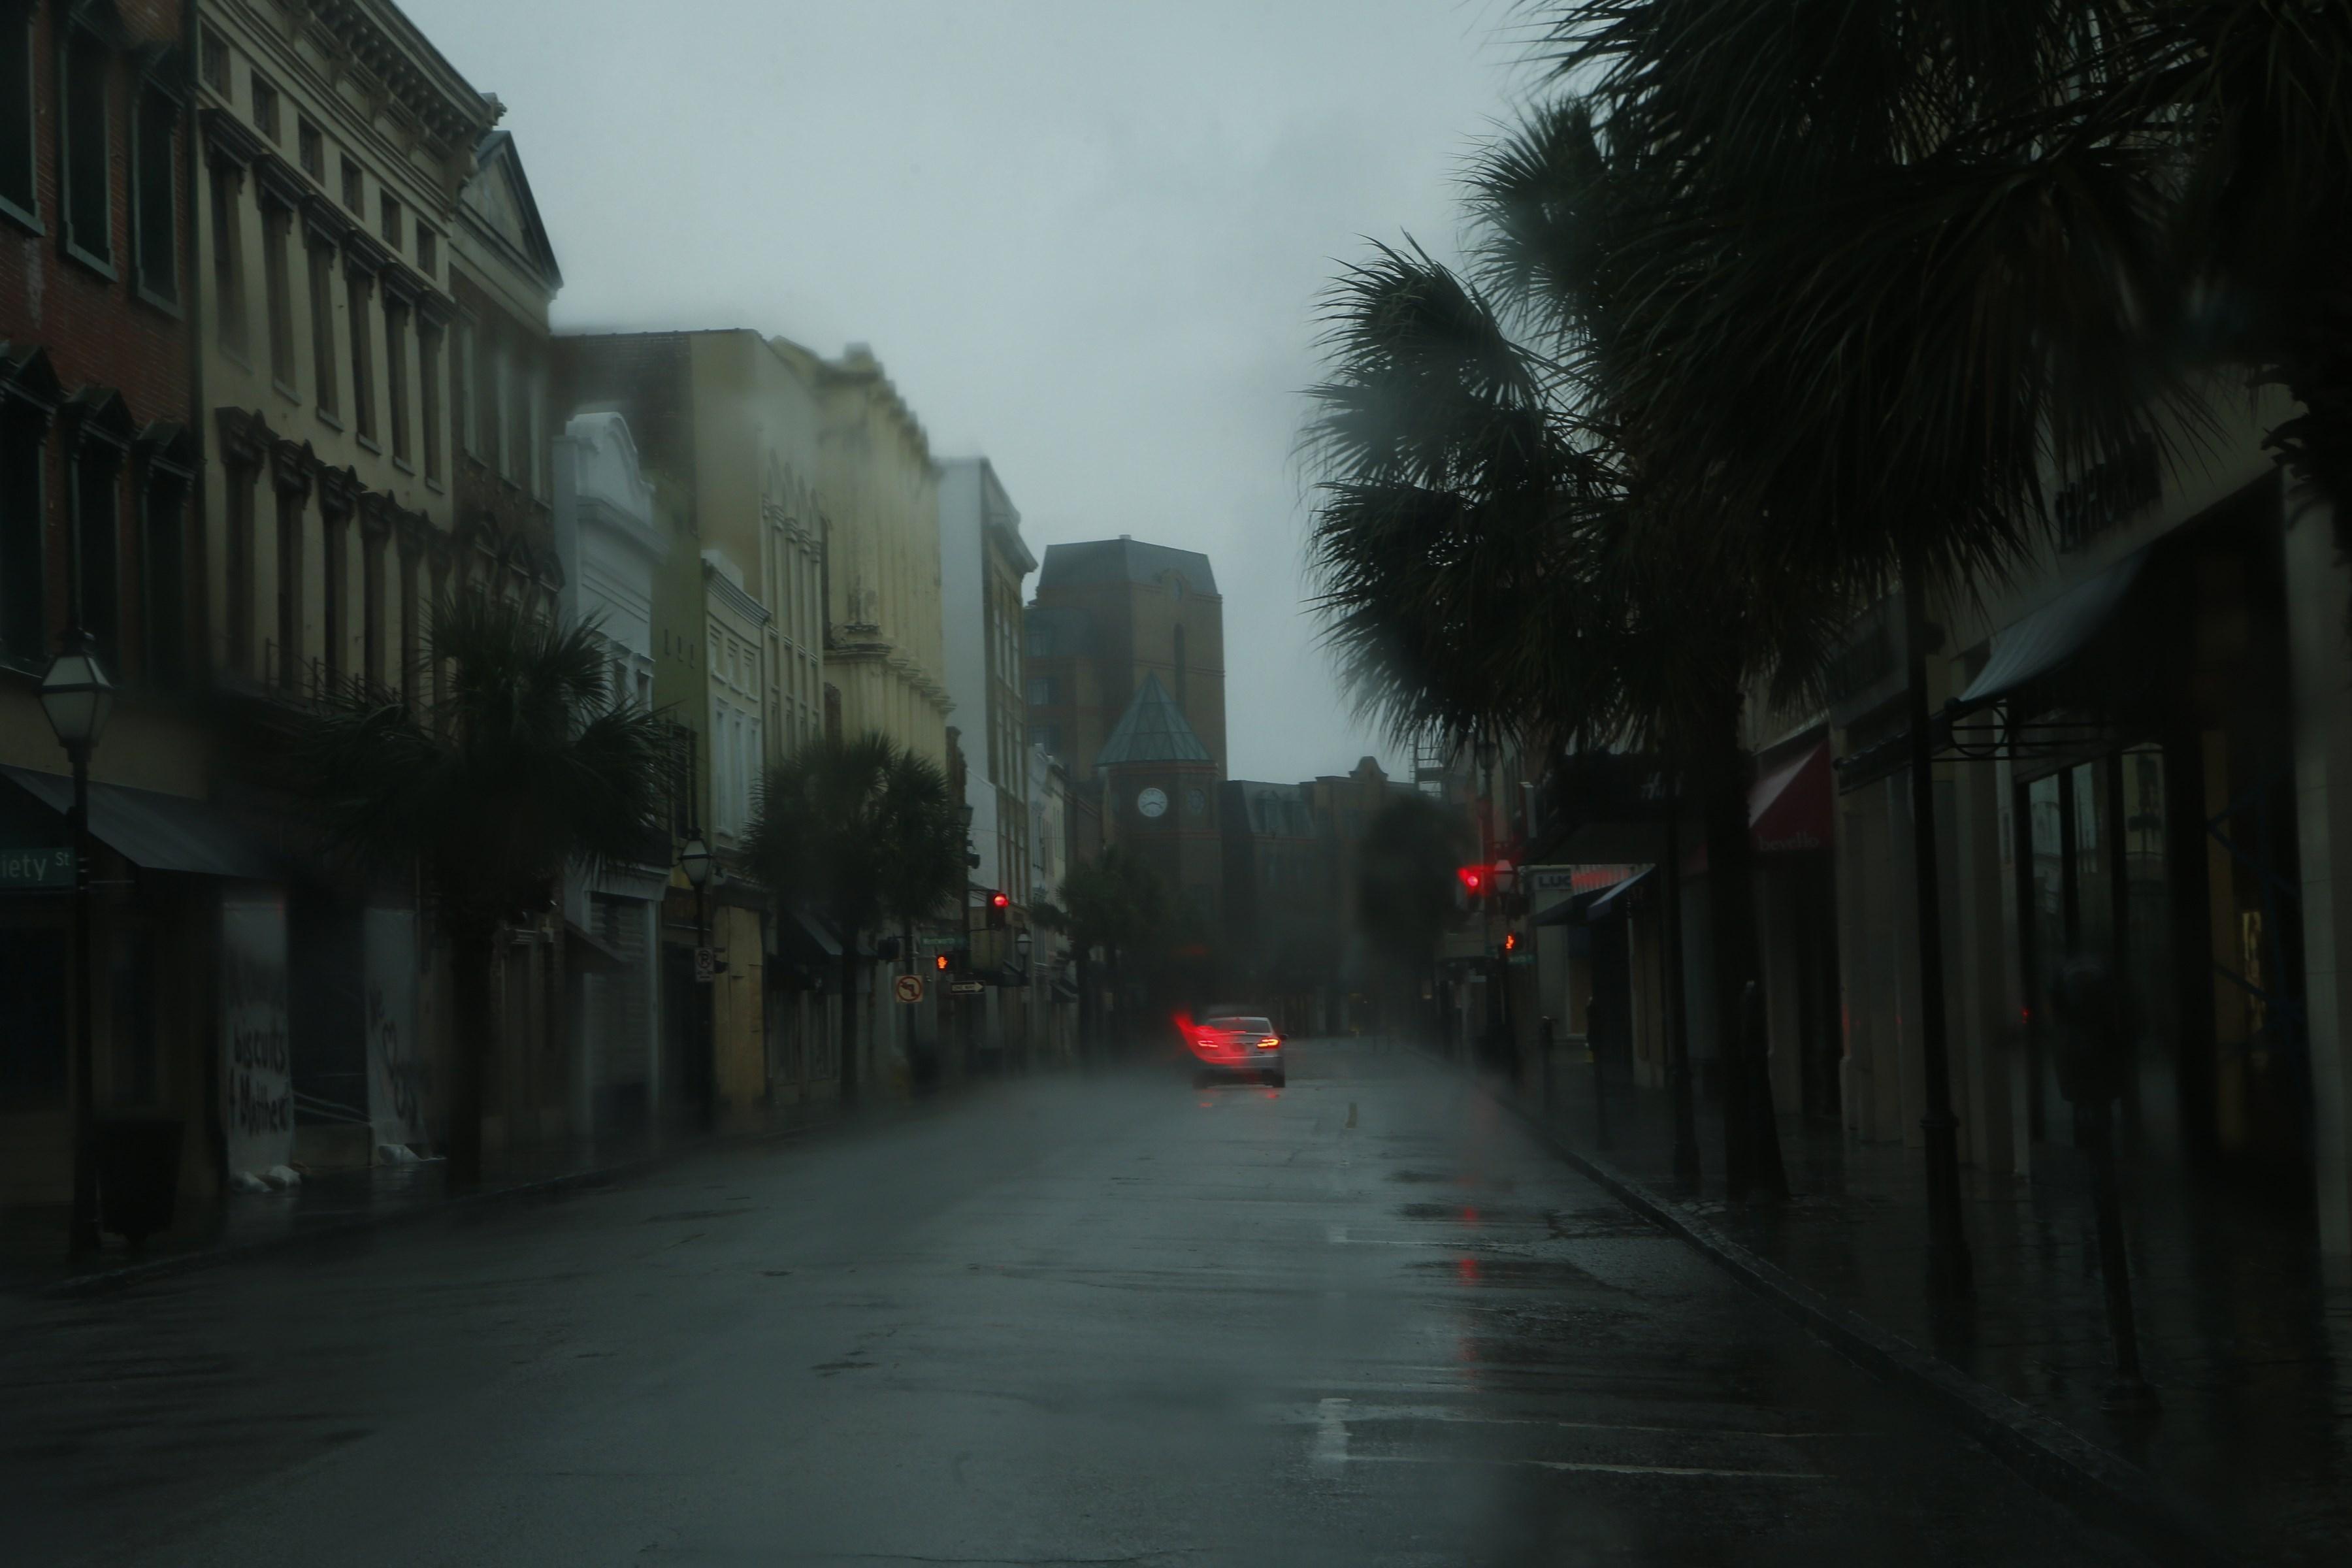 Billeder Orkanen Matthew Stormer Usa Udland Dr